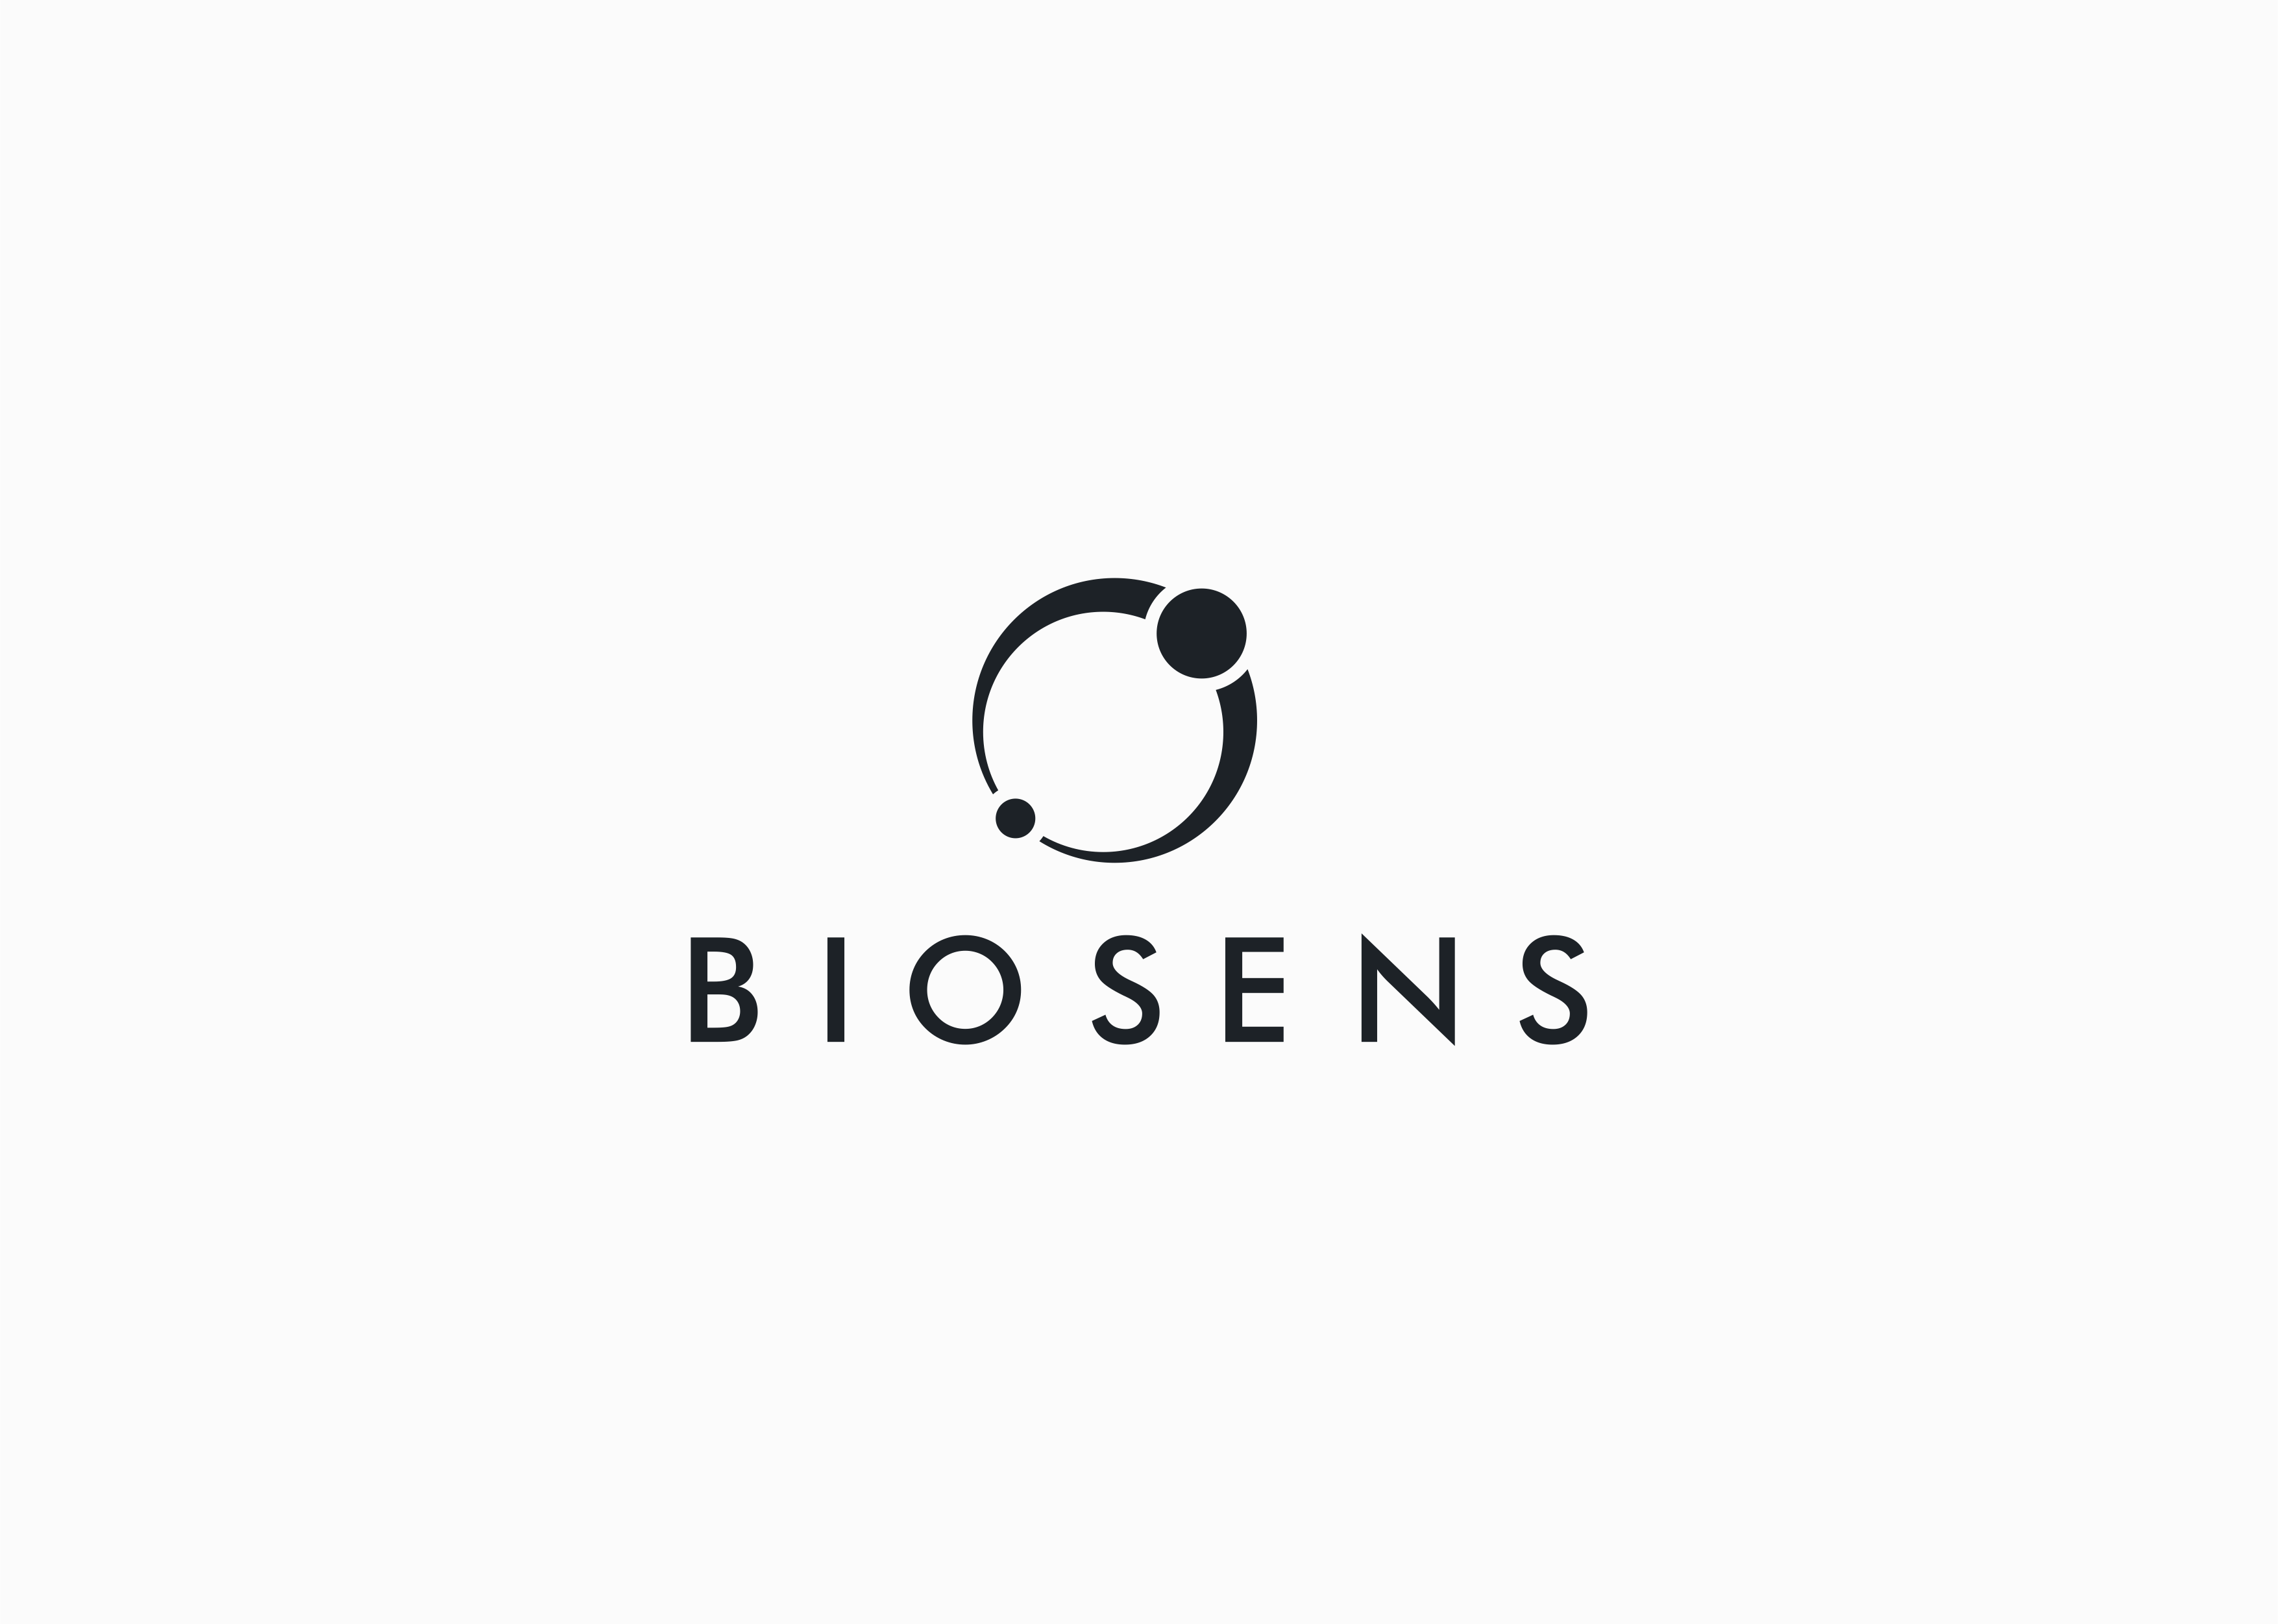 Design a cutting-edge logo for small, innovative pharma company.